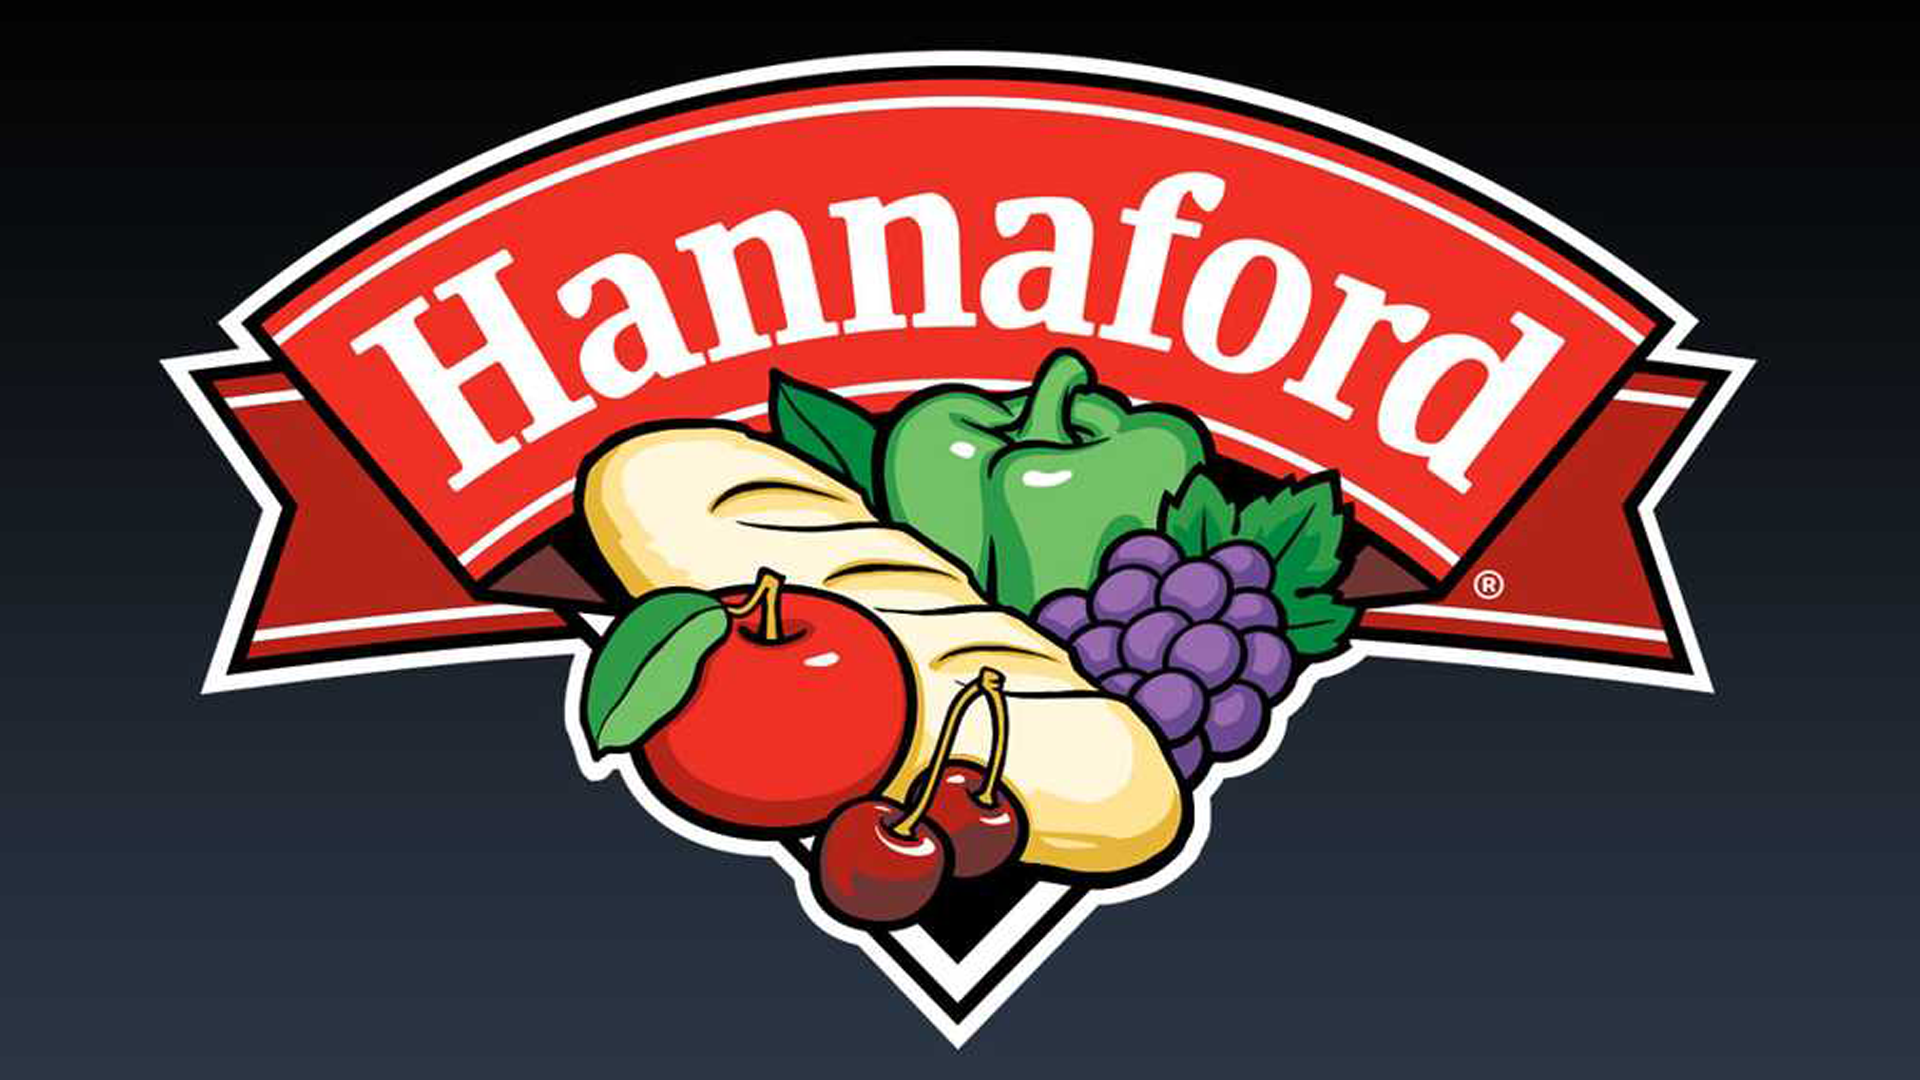 Hannaford (North Ave.)